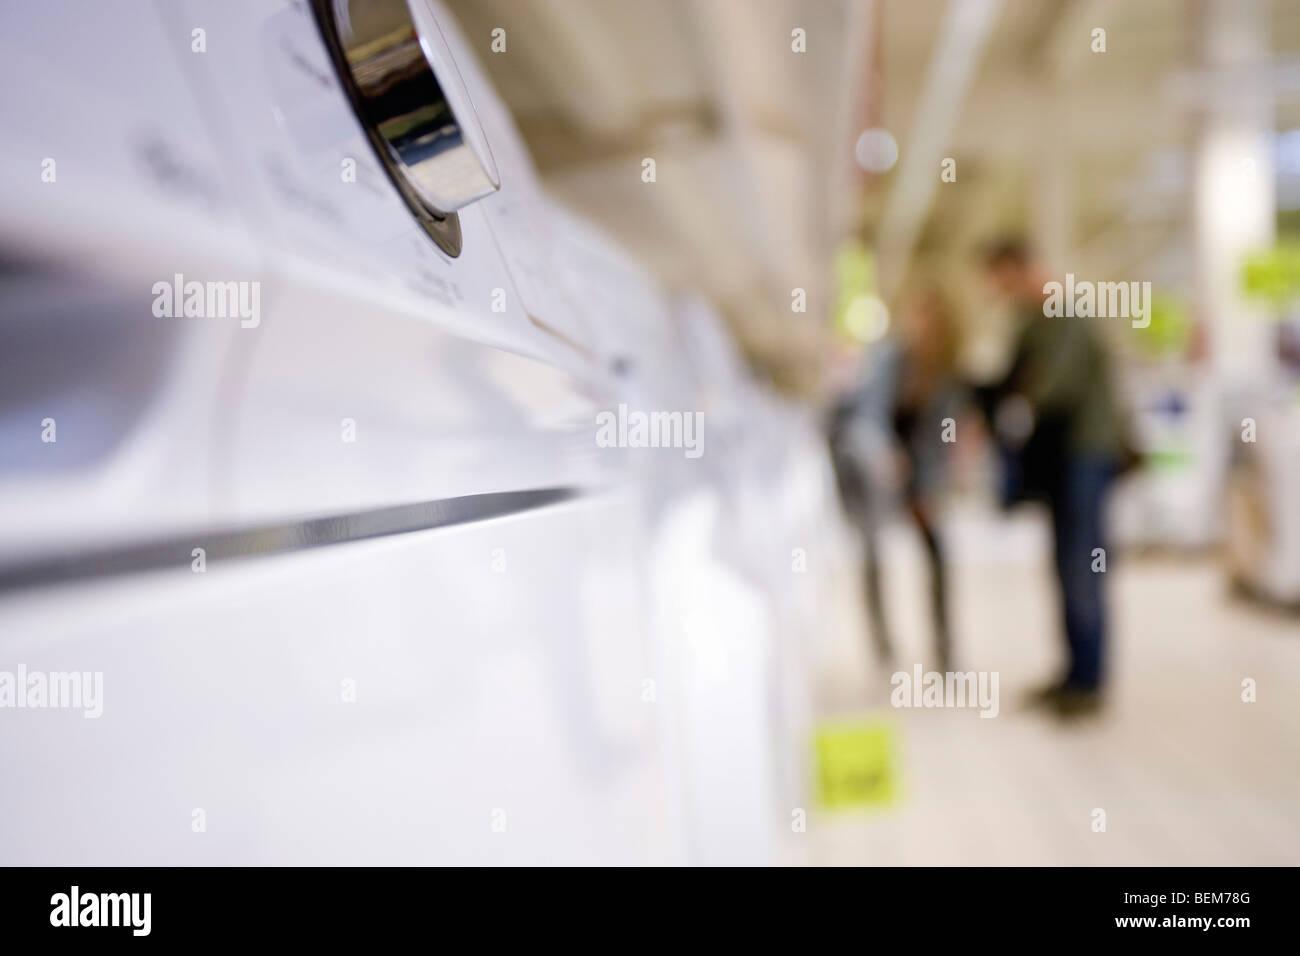 Drehknopf am Gerät, Shopper im Hintergrund Stockbild